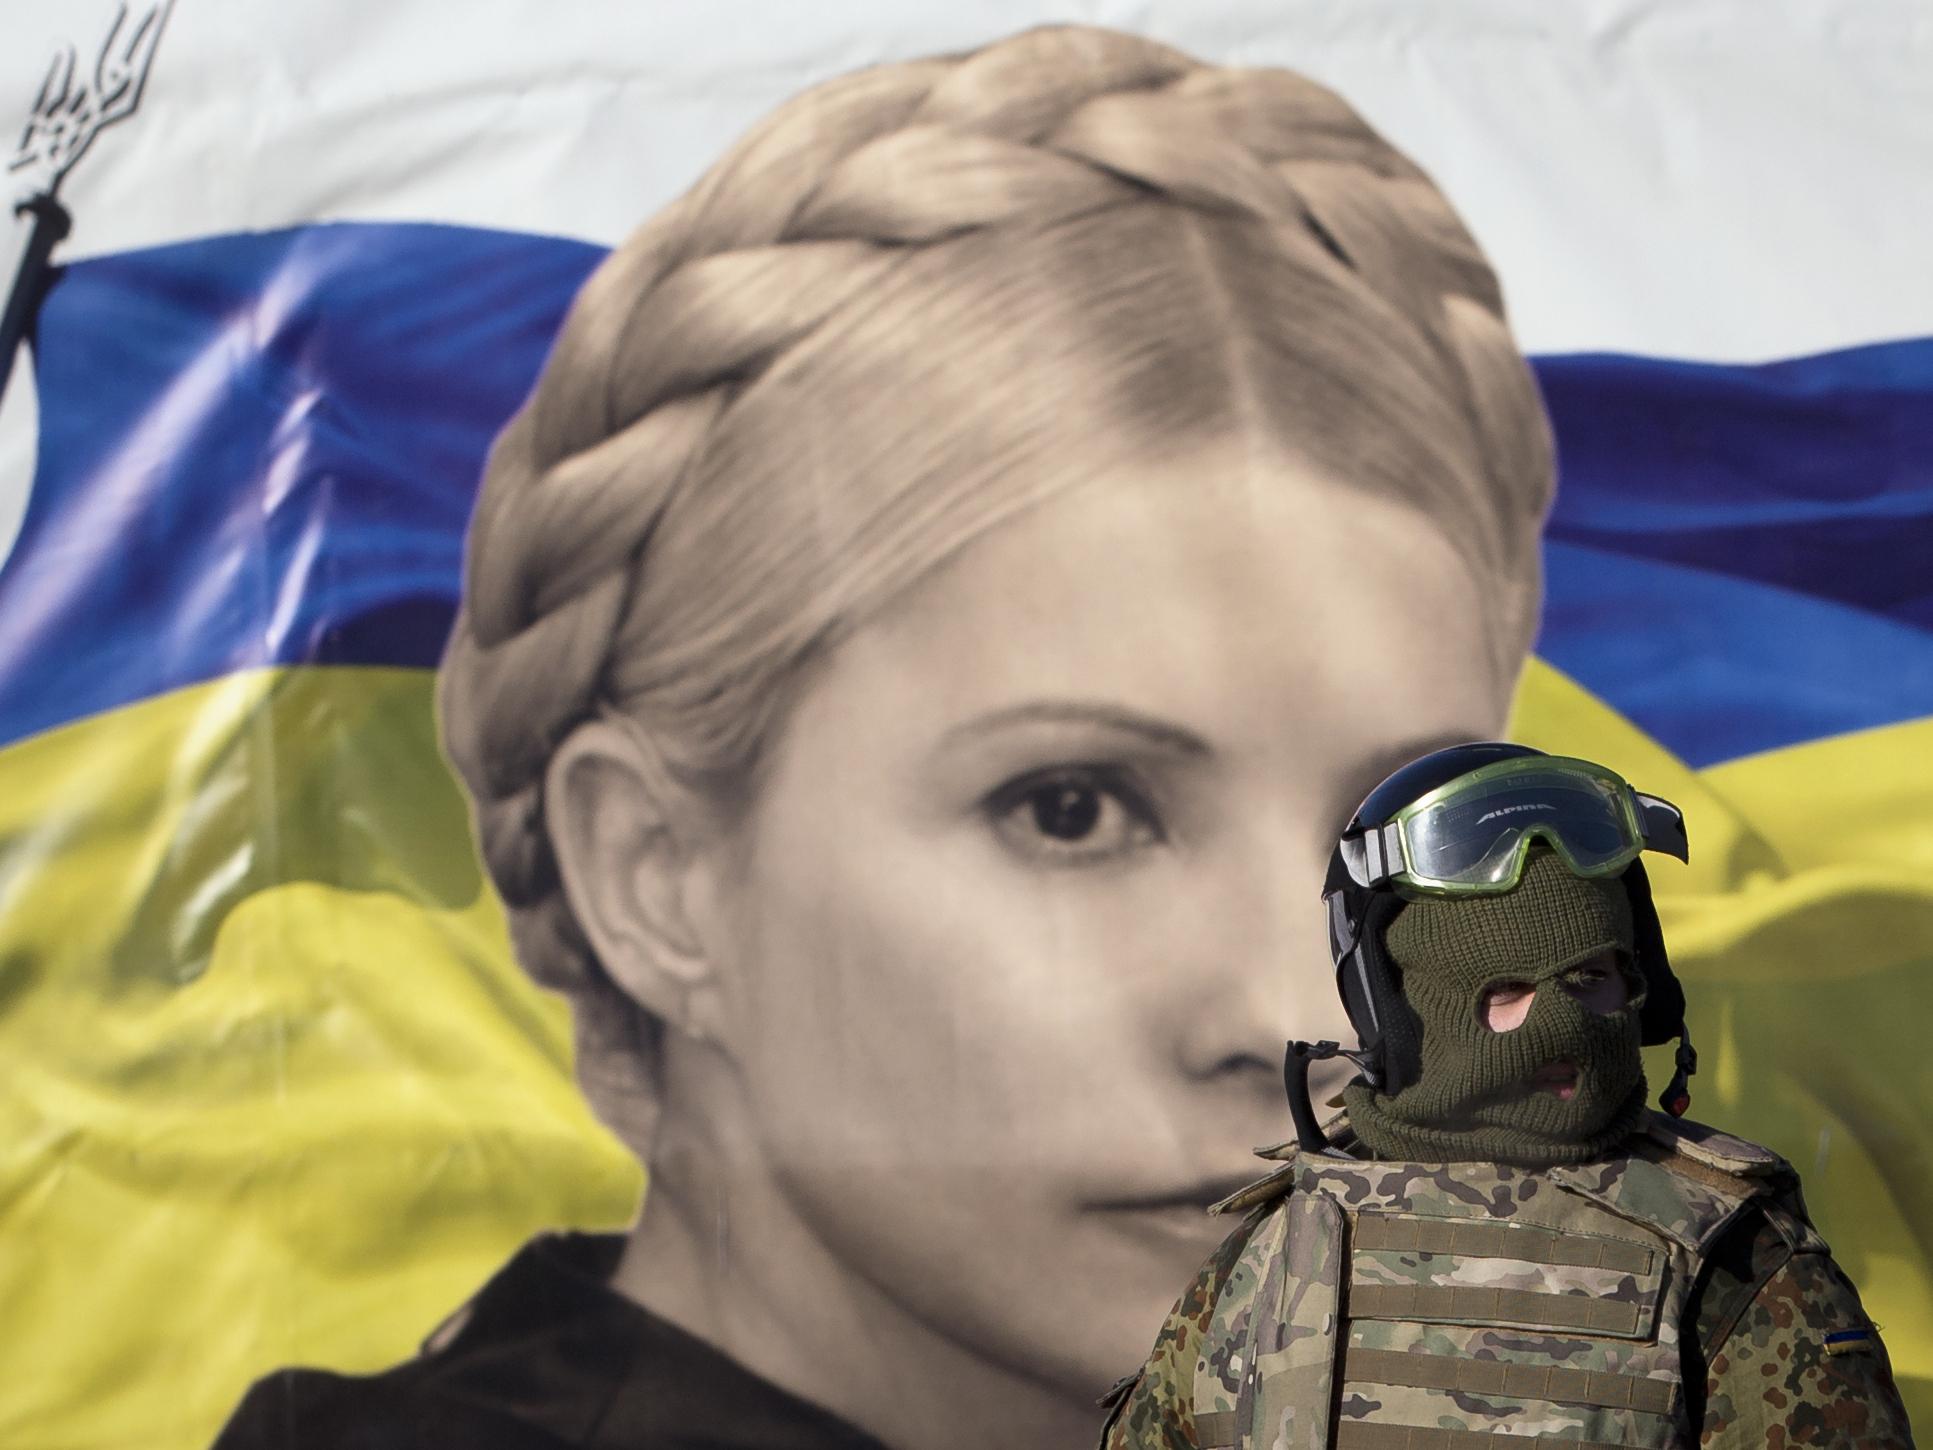 Former Ukrainian Prime Minister Tymoshenko May Soon Be Free